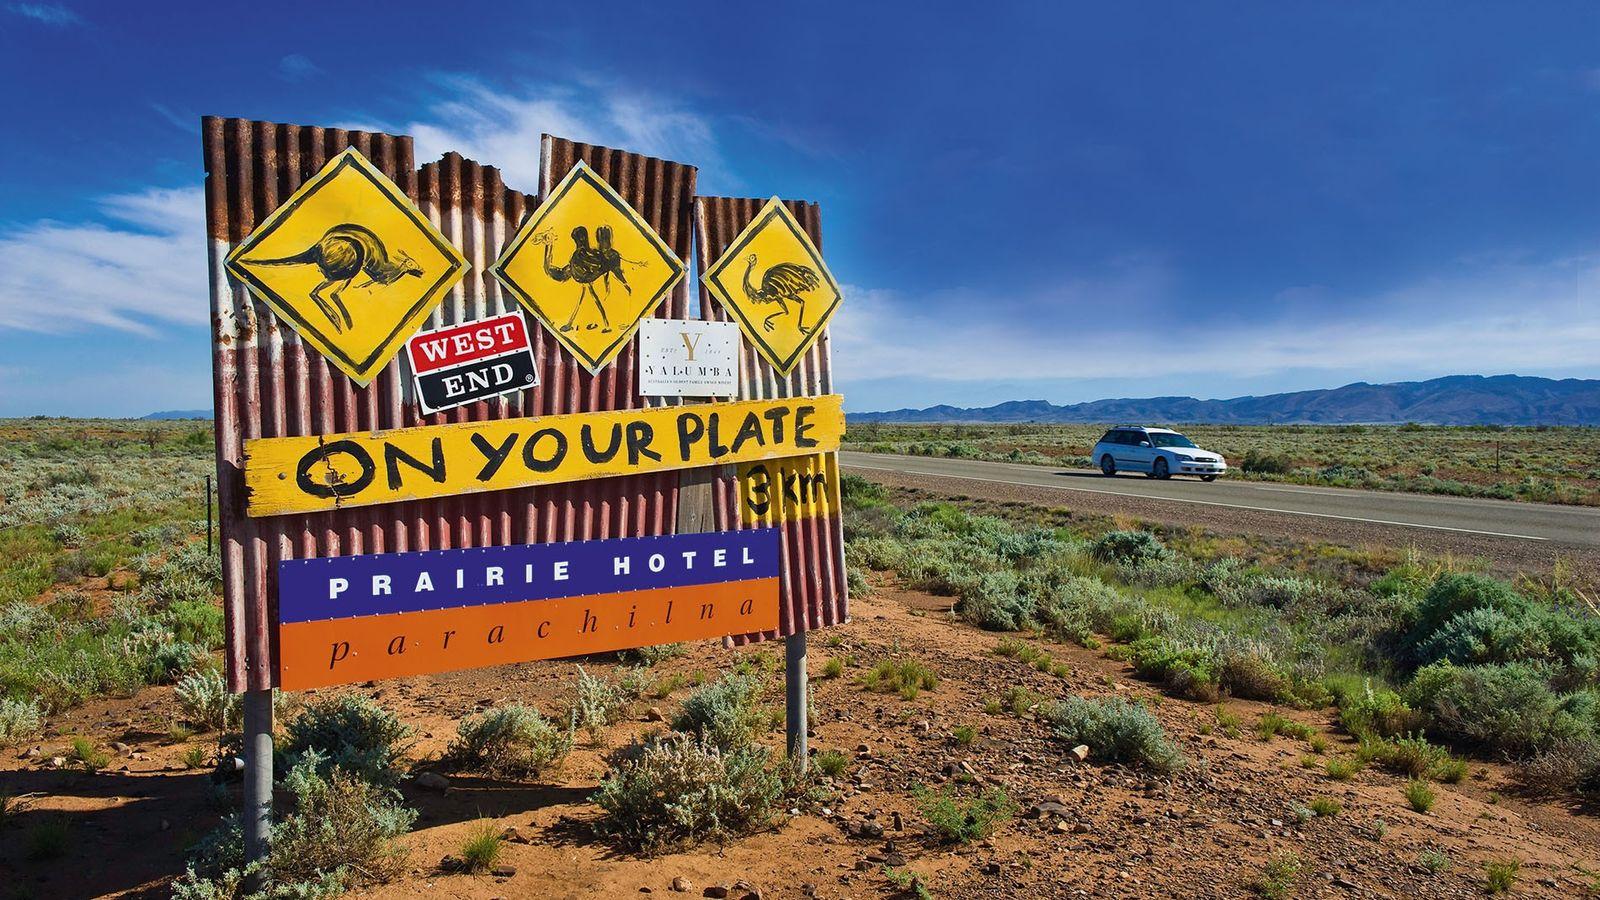 A road sign in Australia